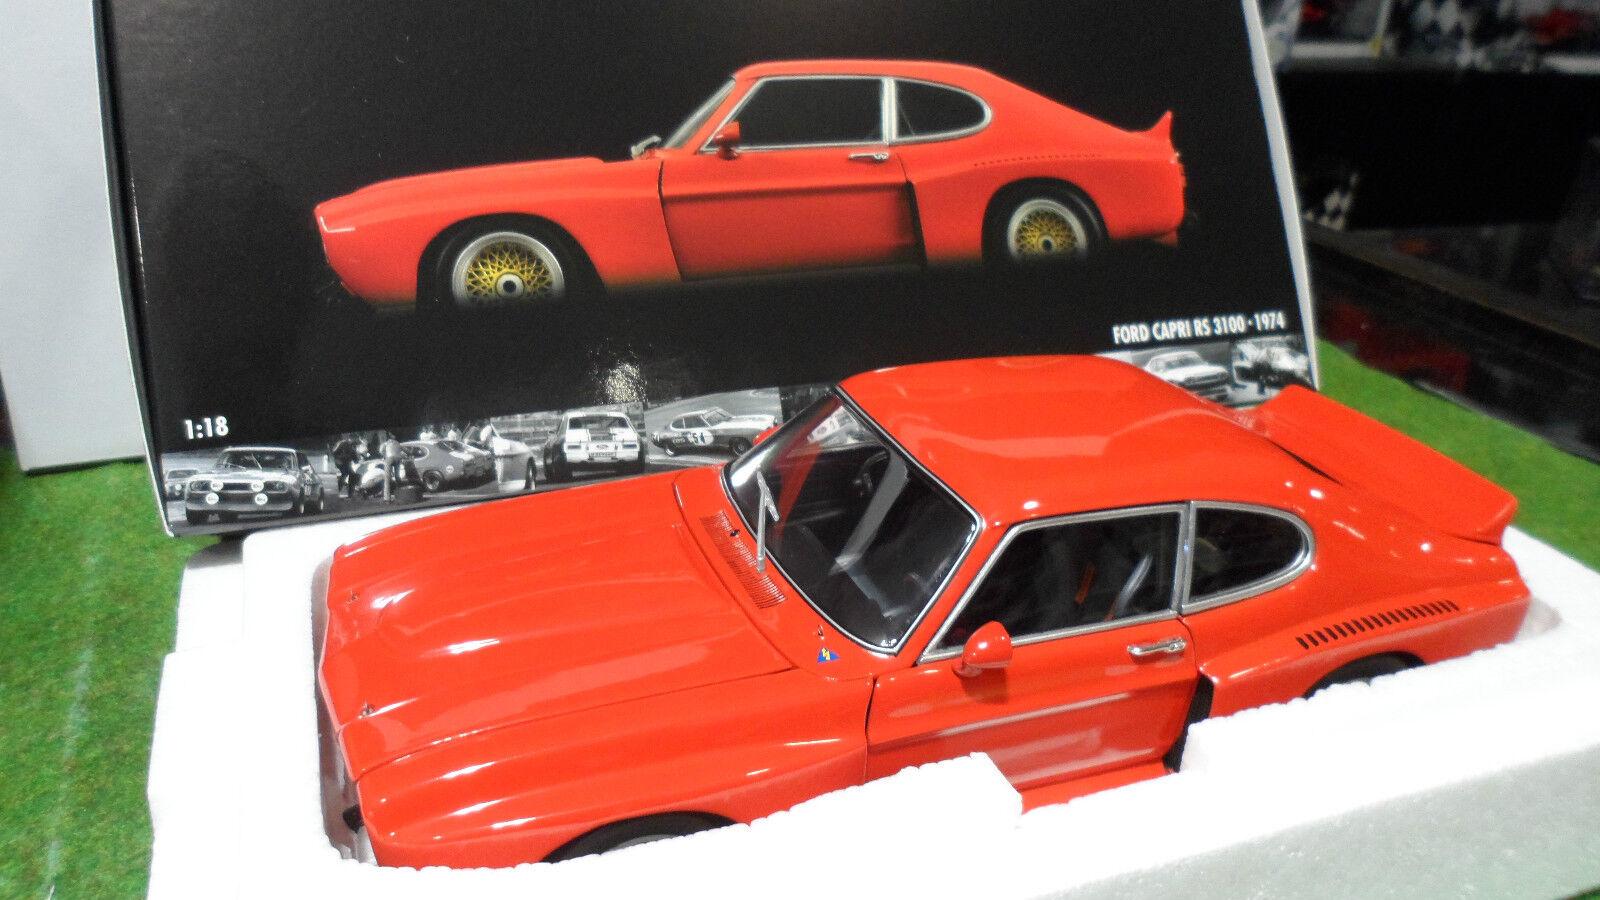 Tienda de moda y compras online. FORD FORD FORD CAPRI RS 3100 1974 1 18 MINICHAMPS 180748001 voiture miniature d collection  precios bajos